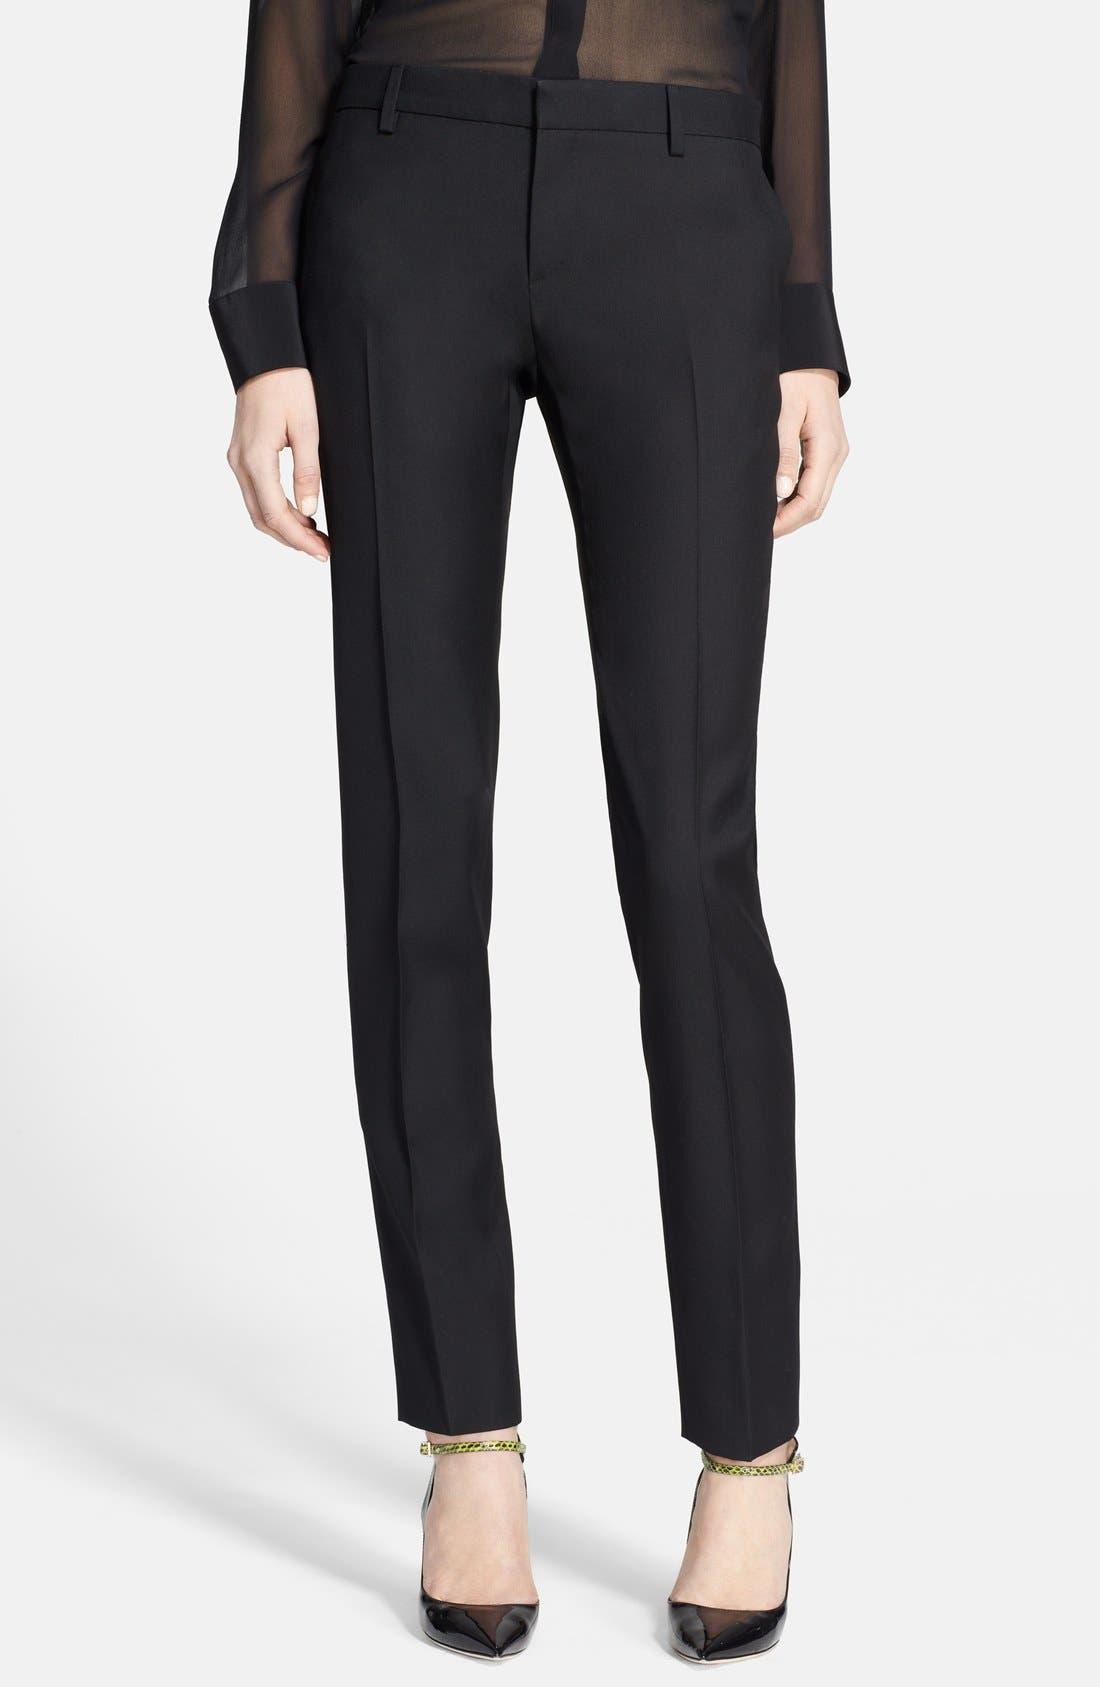 SAINT LAURENT Skinny Pants, Main, color, 001